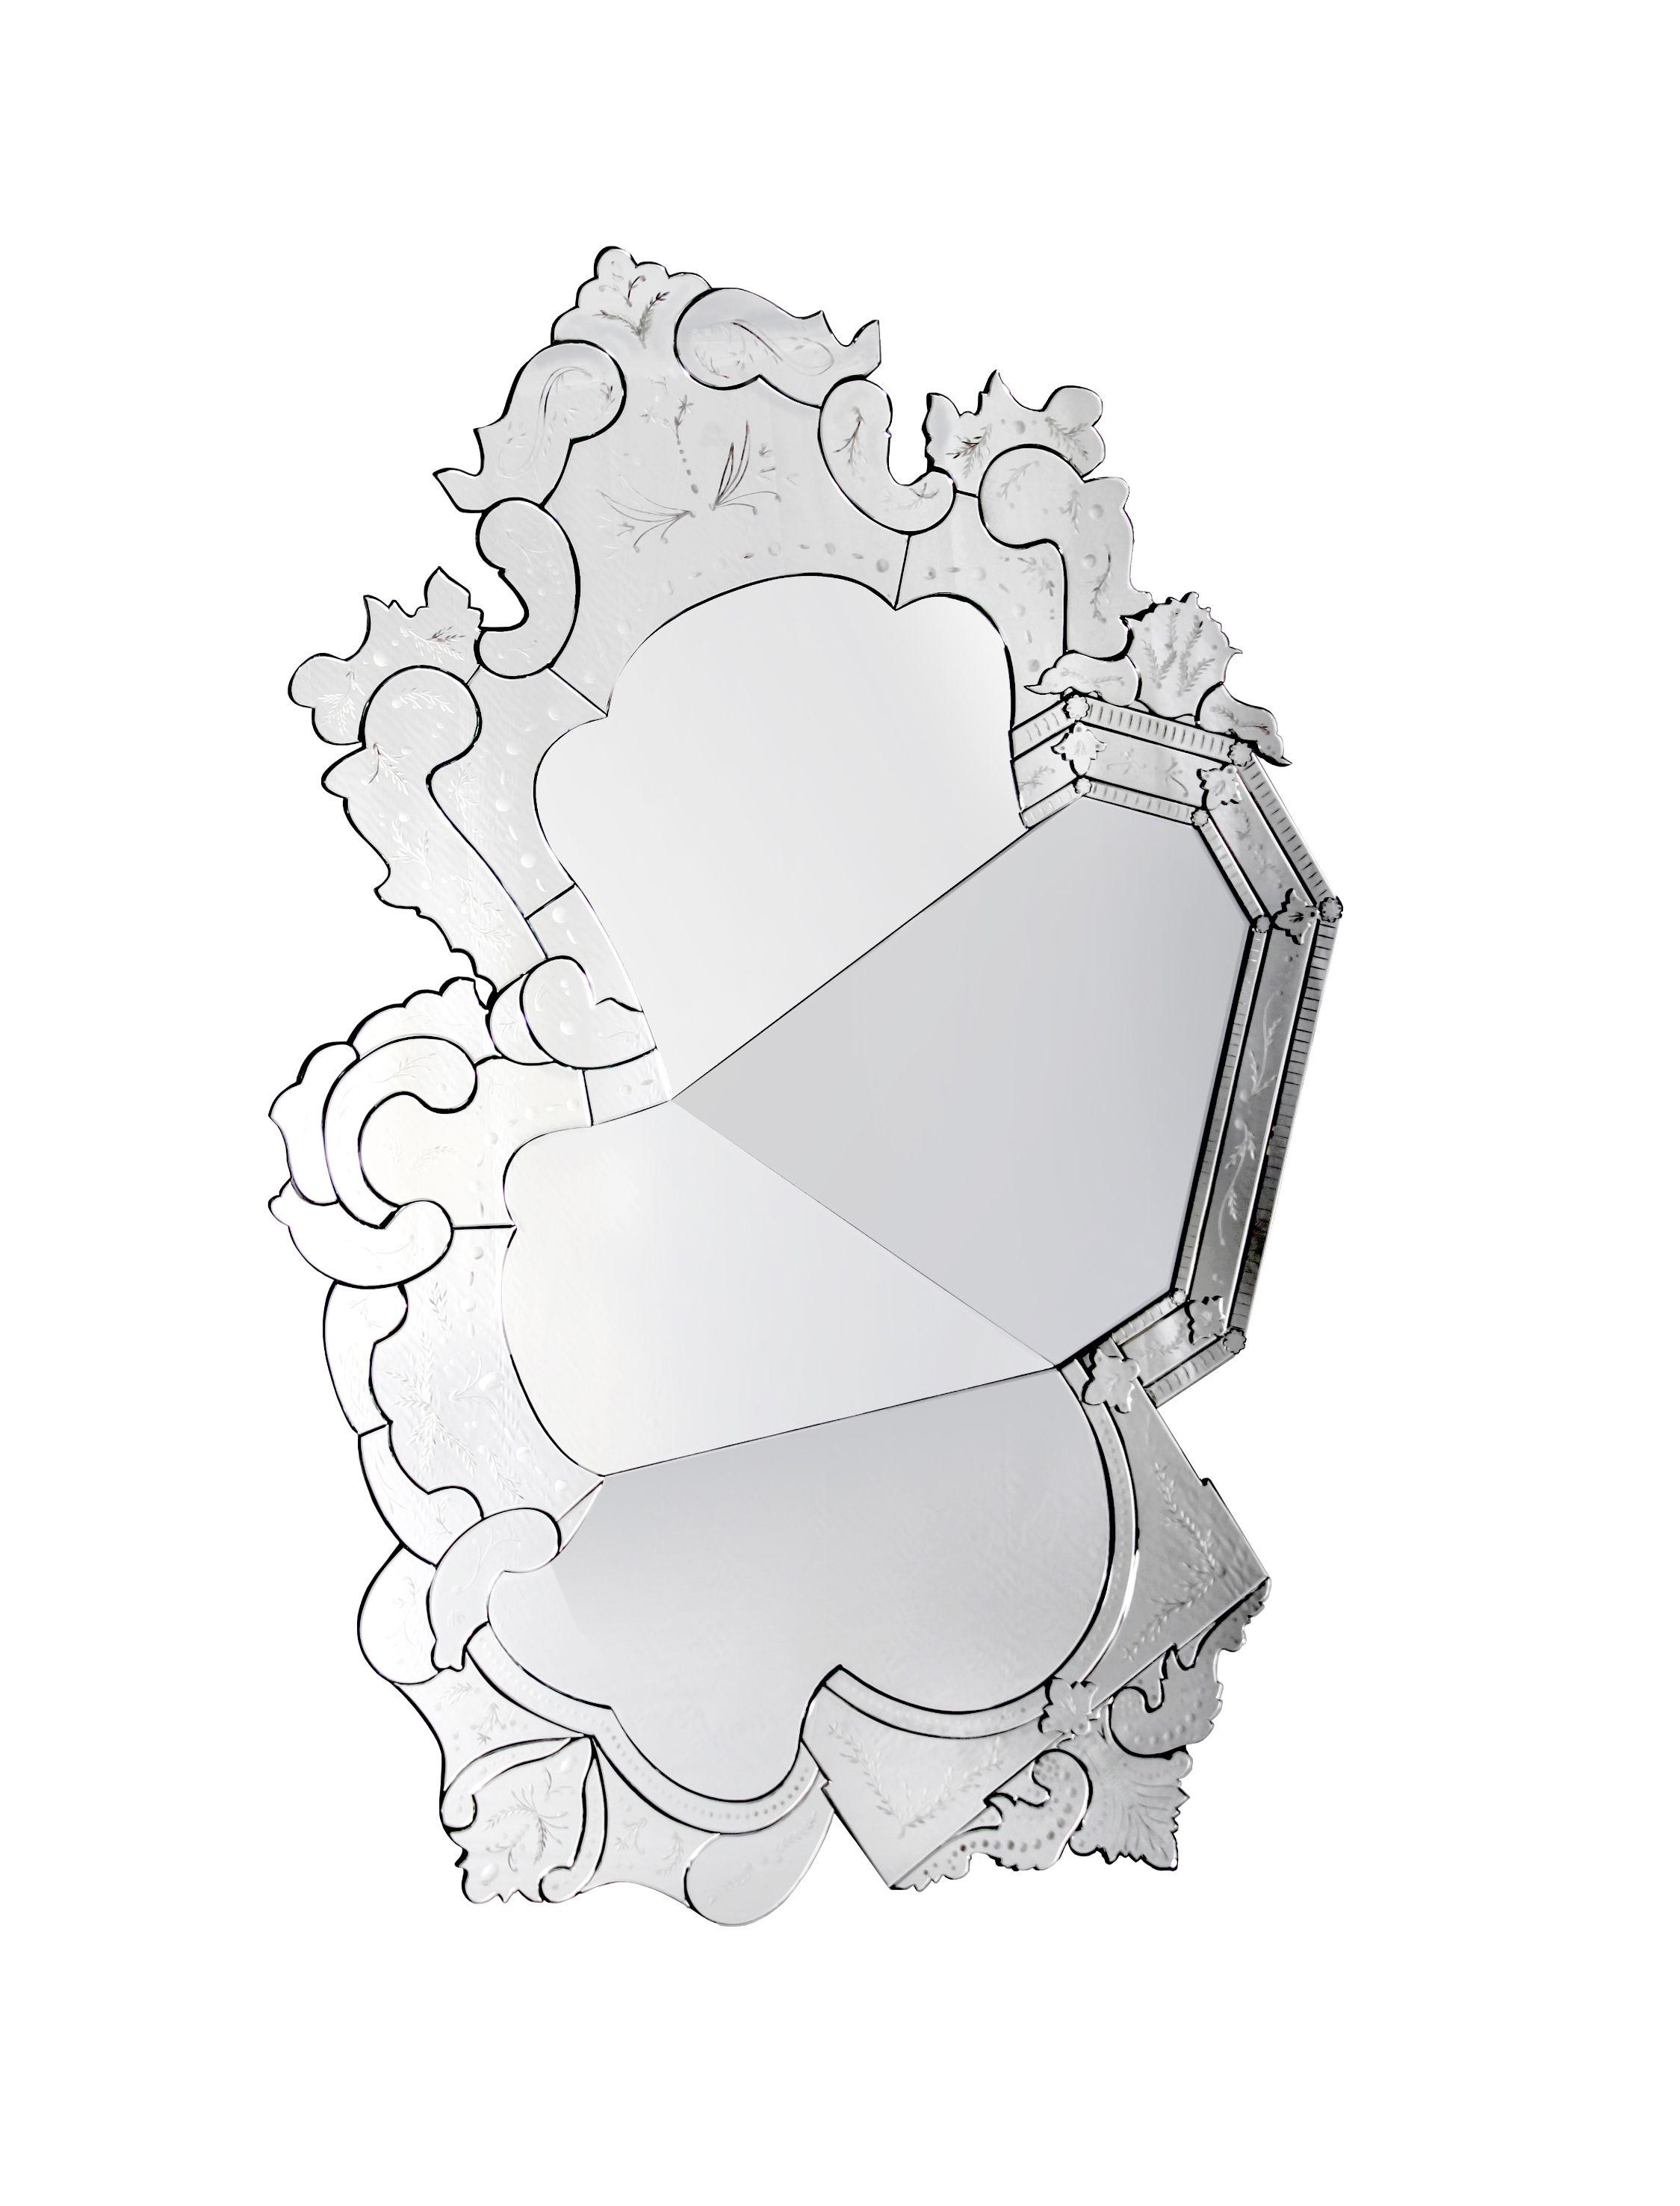 Venice Mirror By Boca do Lobo | www.bocadolobo.com #bocadolobo #luxuryfurniture #exclusivedesign #interiodesign #designideas #mirror #venice